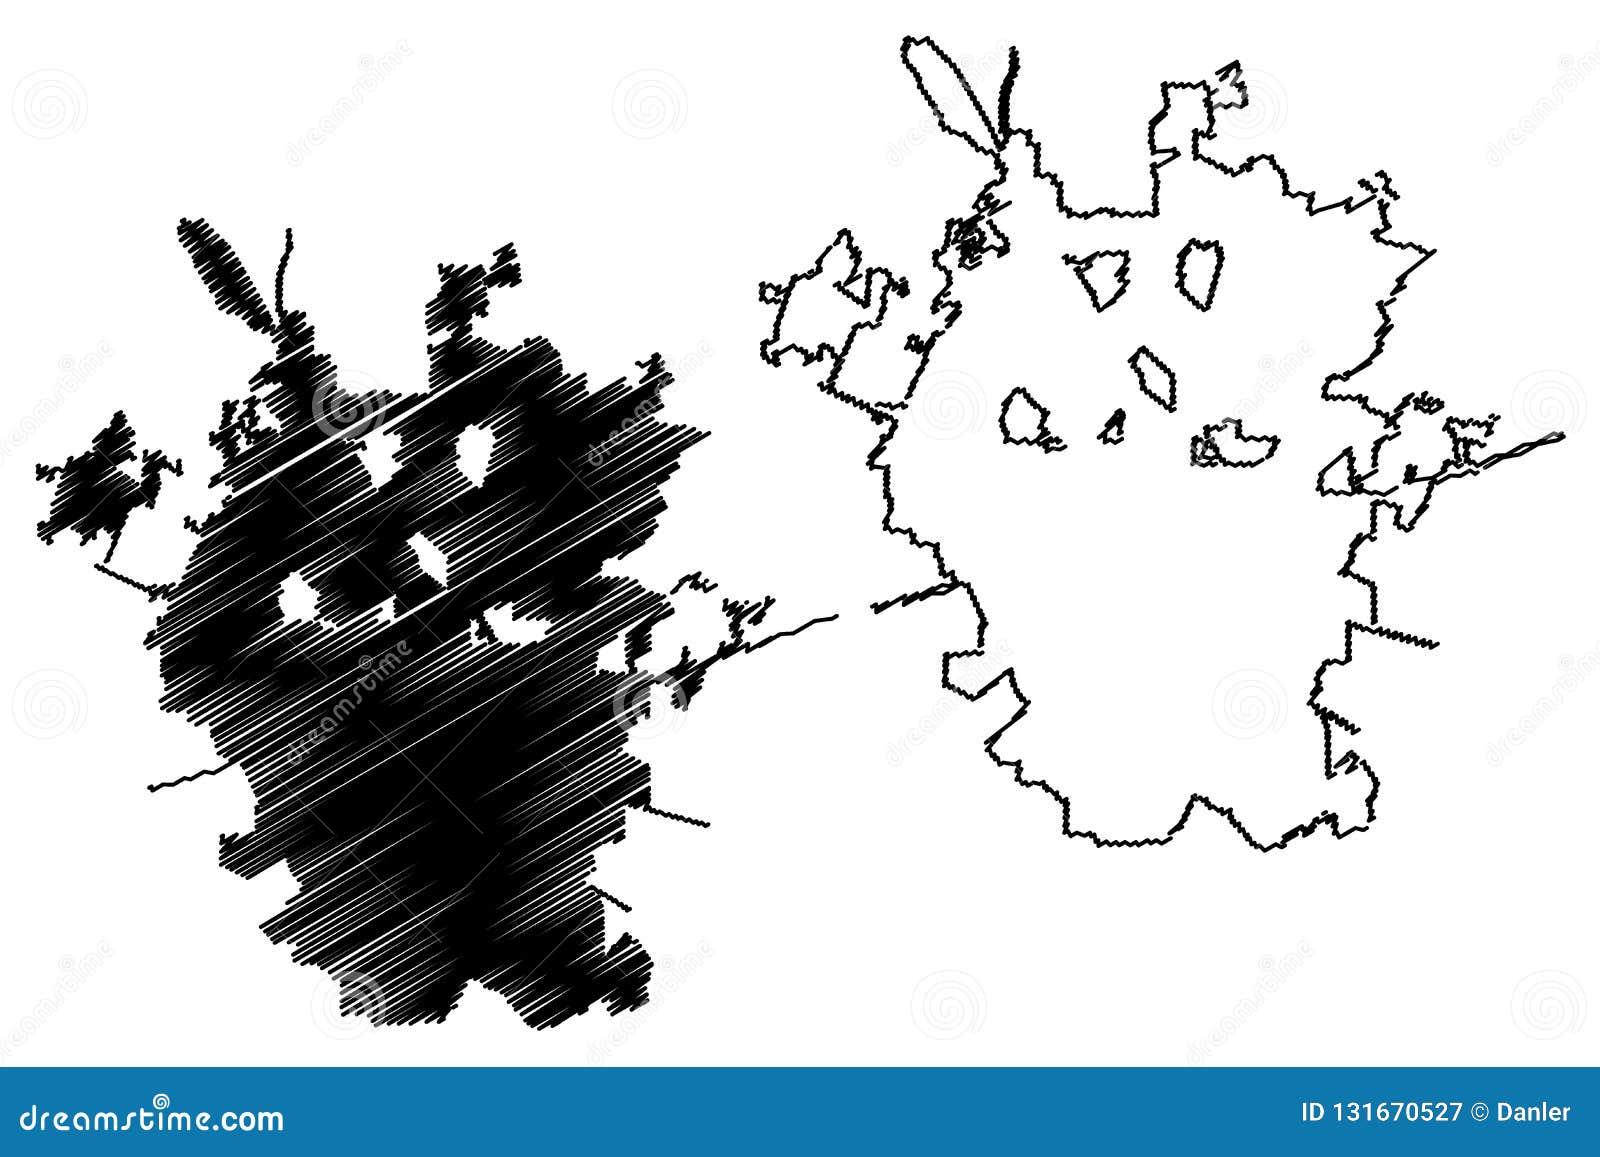 San Antonio City Map Vector Stock Vector - Illustration of doodle ...